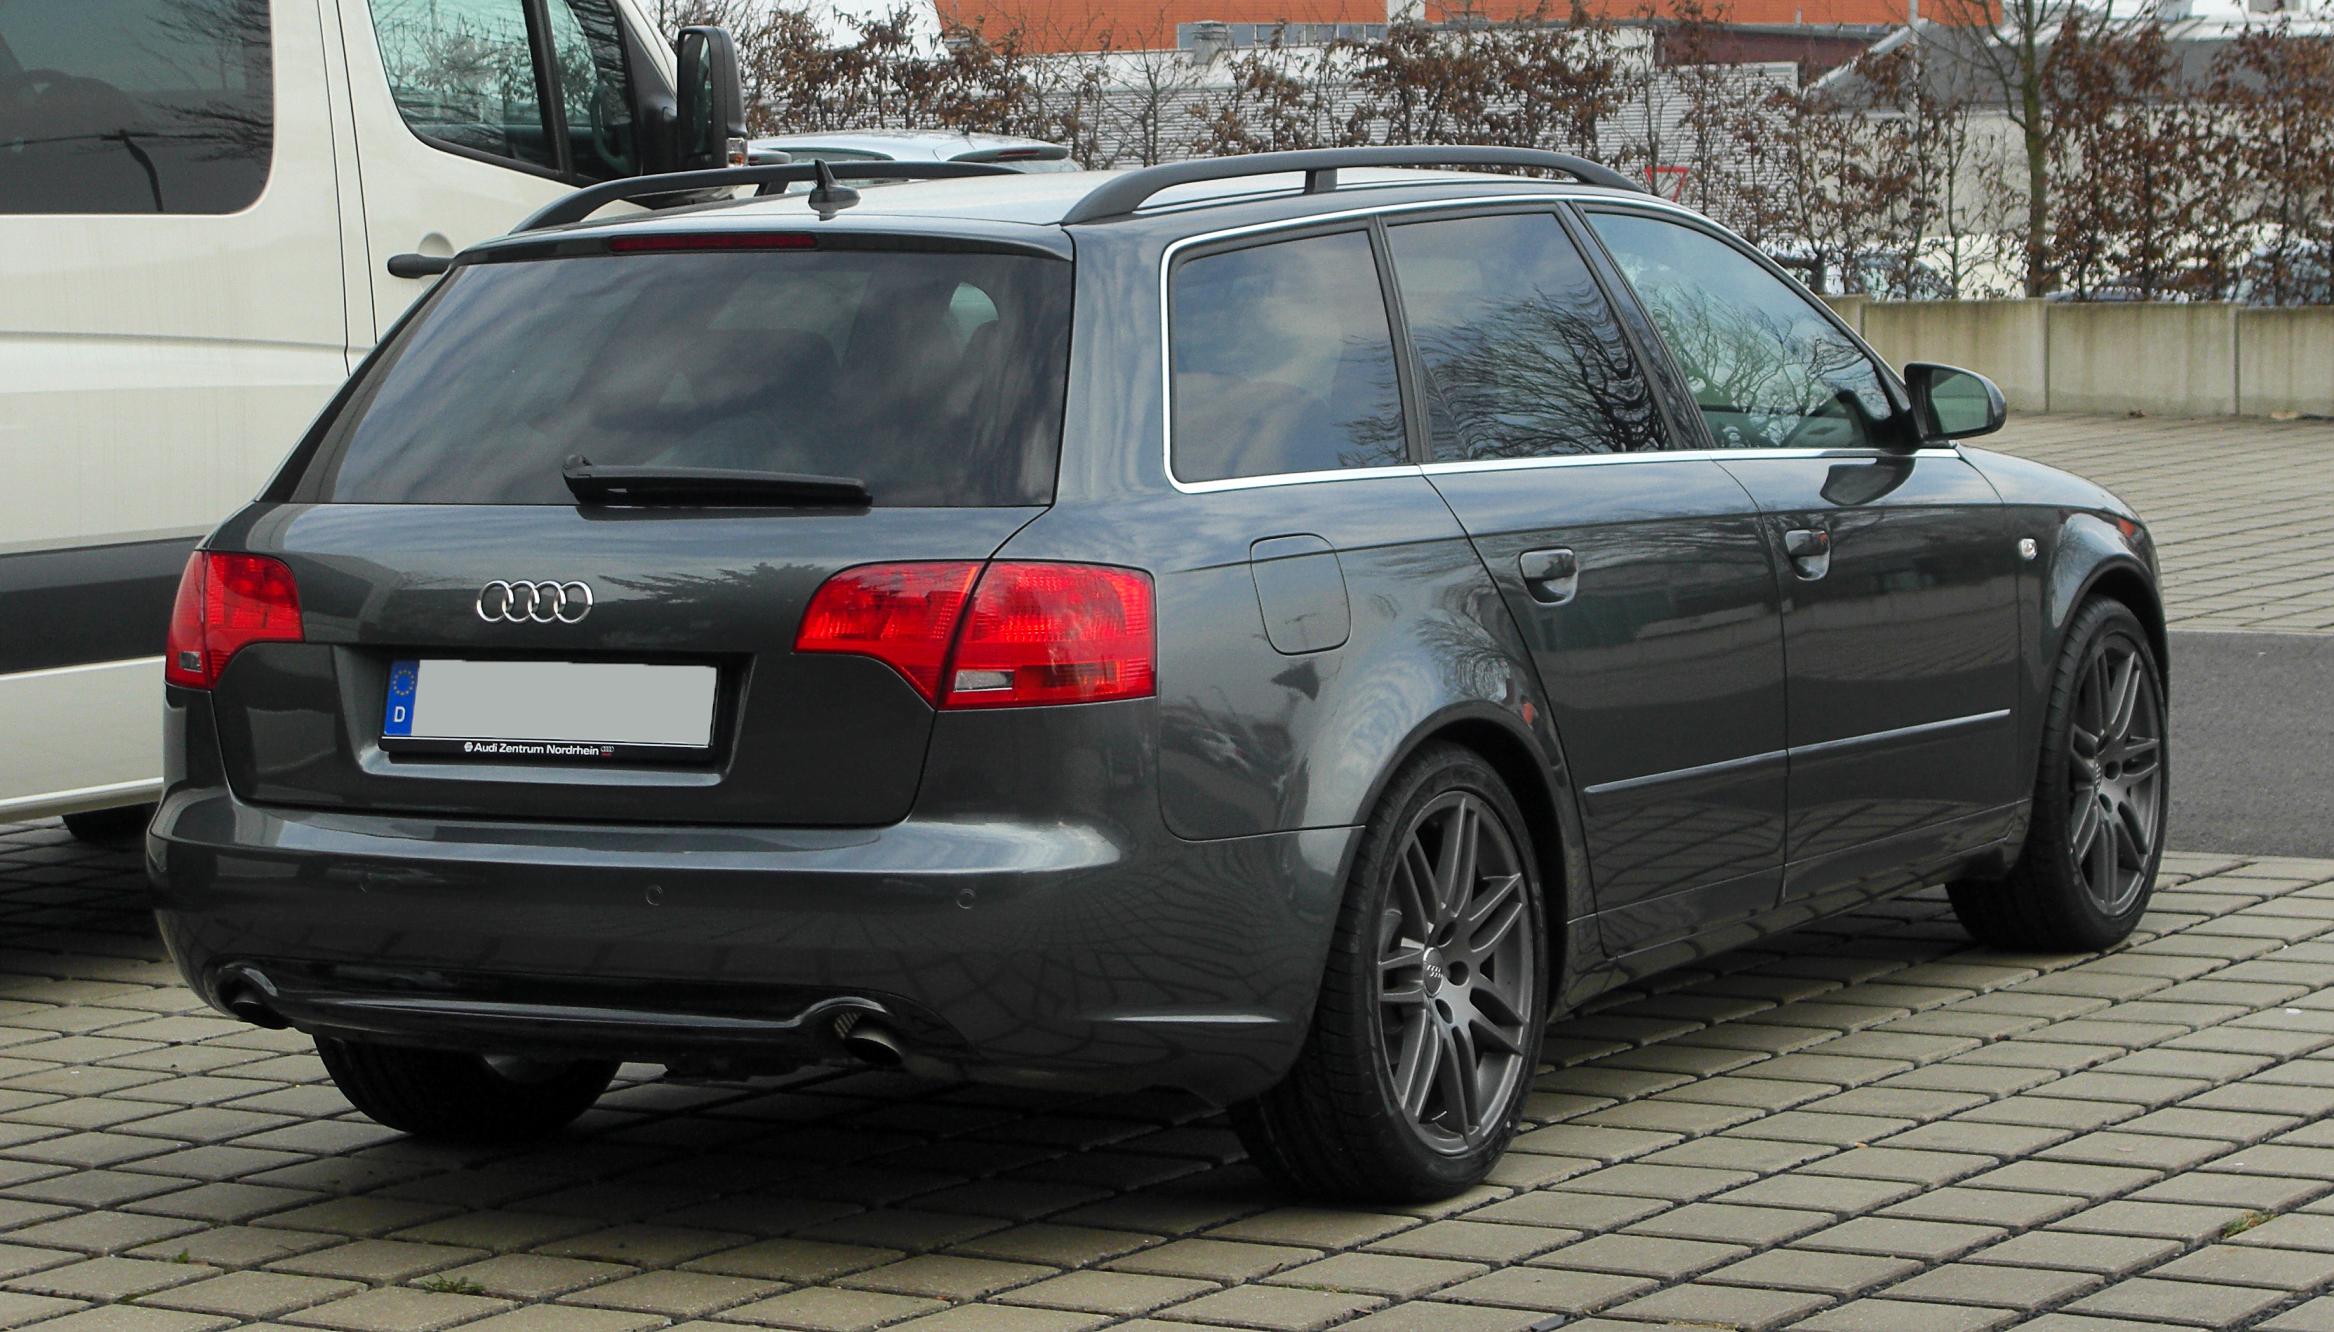 File:Audi A4 Avant (B7) – Heckansicht, 12. März 2011, Düsseldorf.jpg - Wikimedia Commons